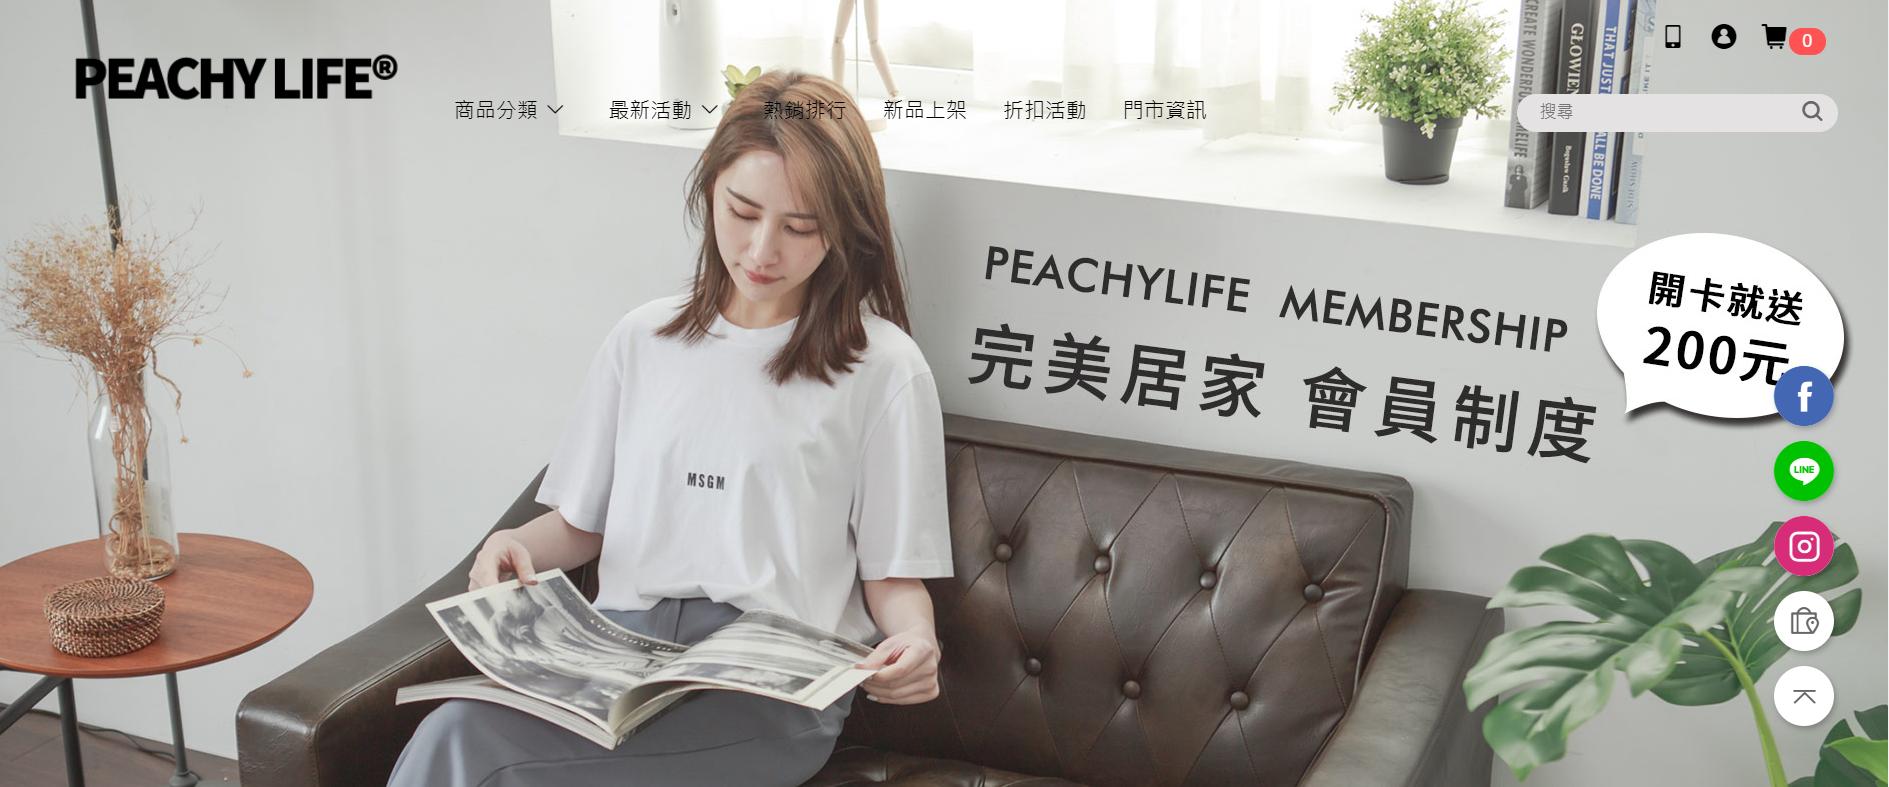 91APP 人氣店家 Peachy LIfe